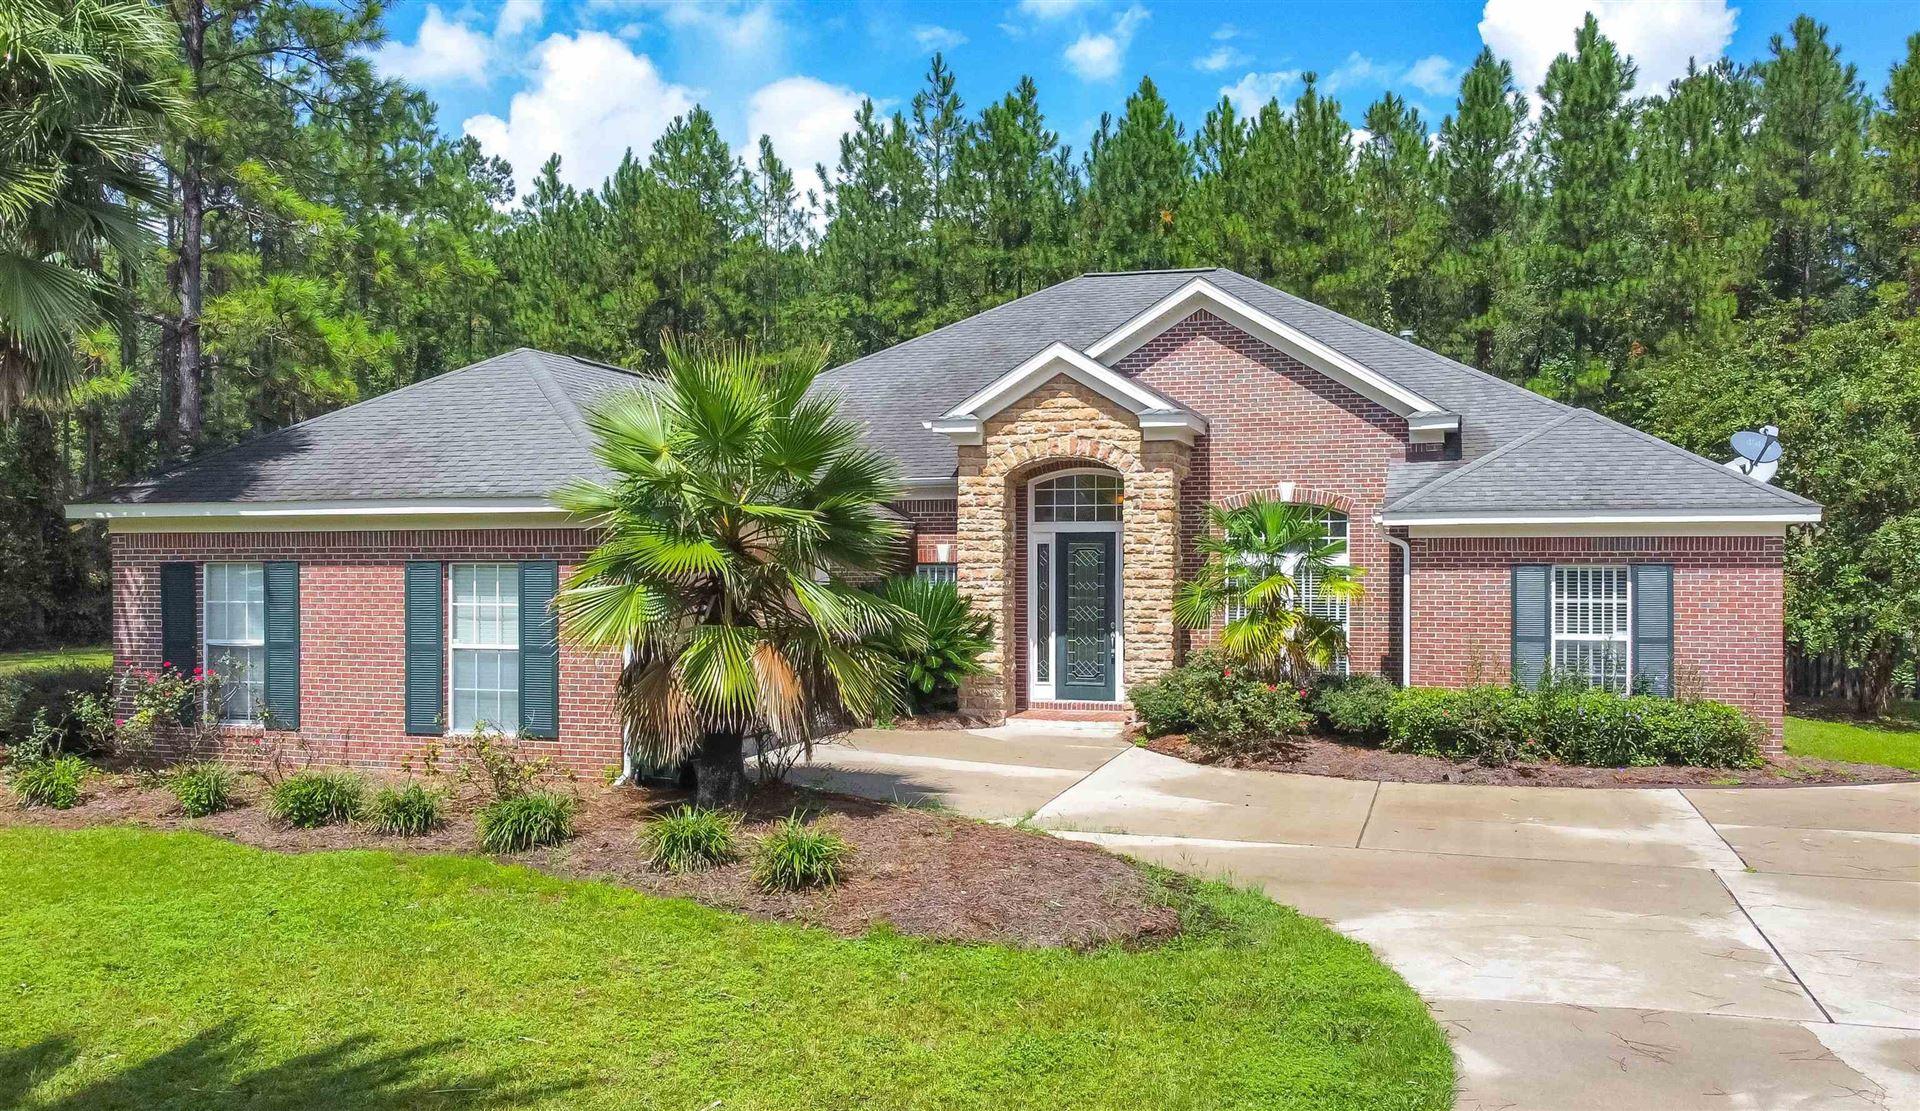 168 Sand Pine Trail, Crawfordville, FL 32327 - MLS#: 335719